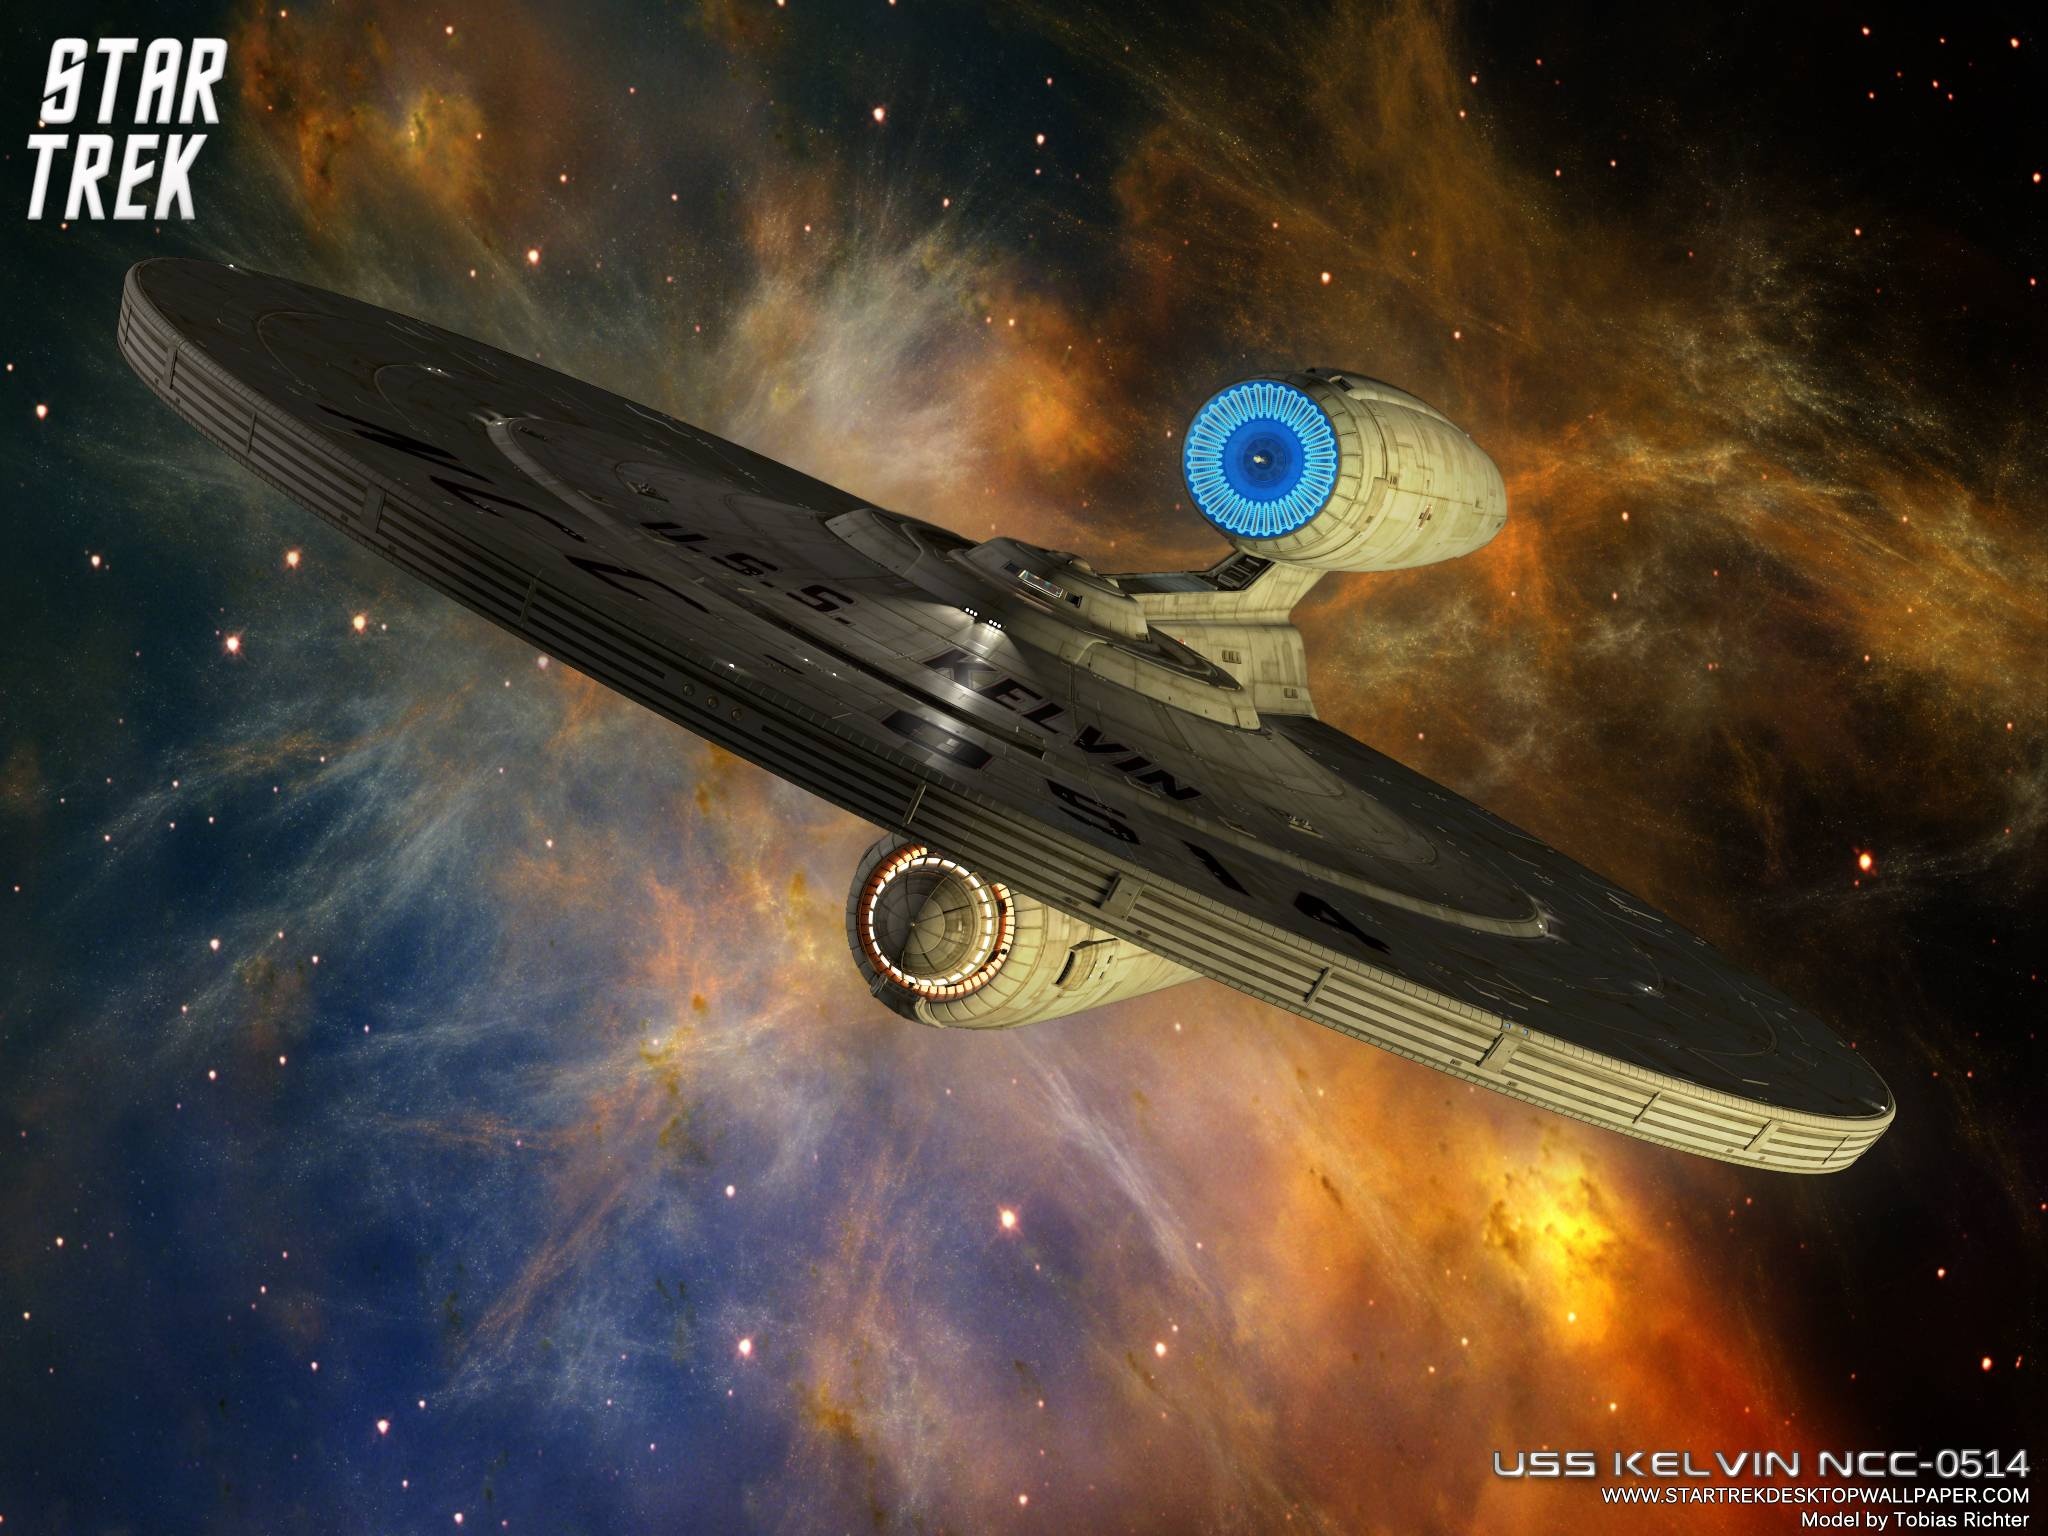 Star Trek Ships Wallpapers 2048x1536